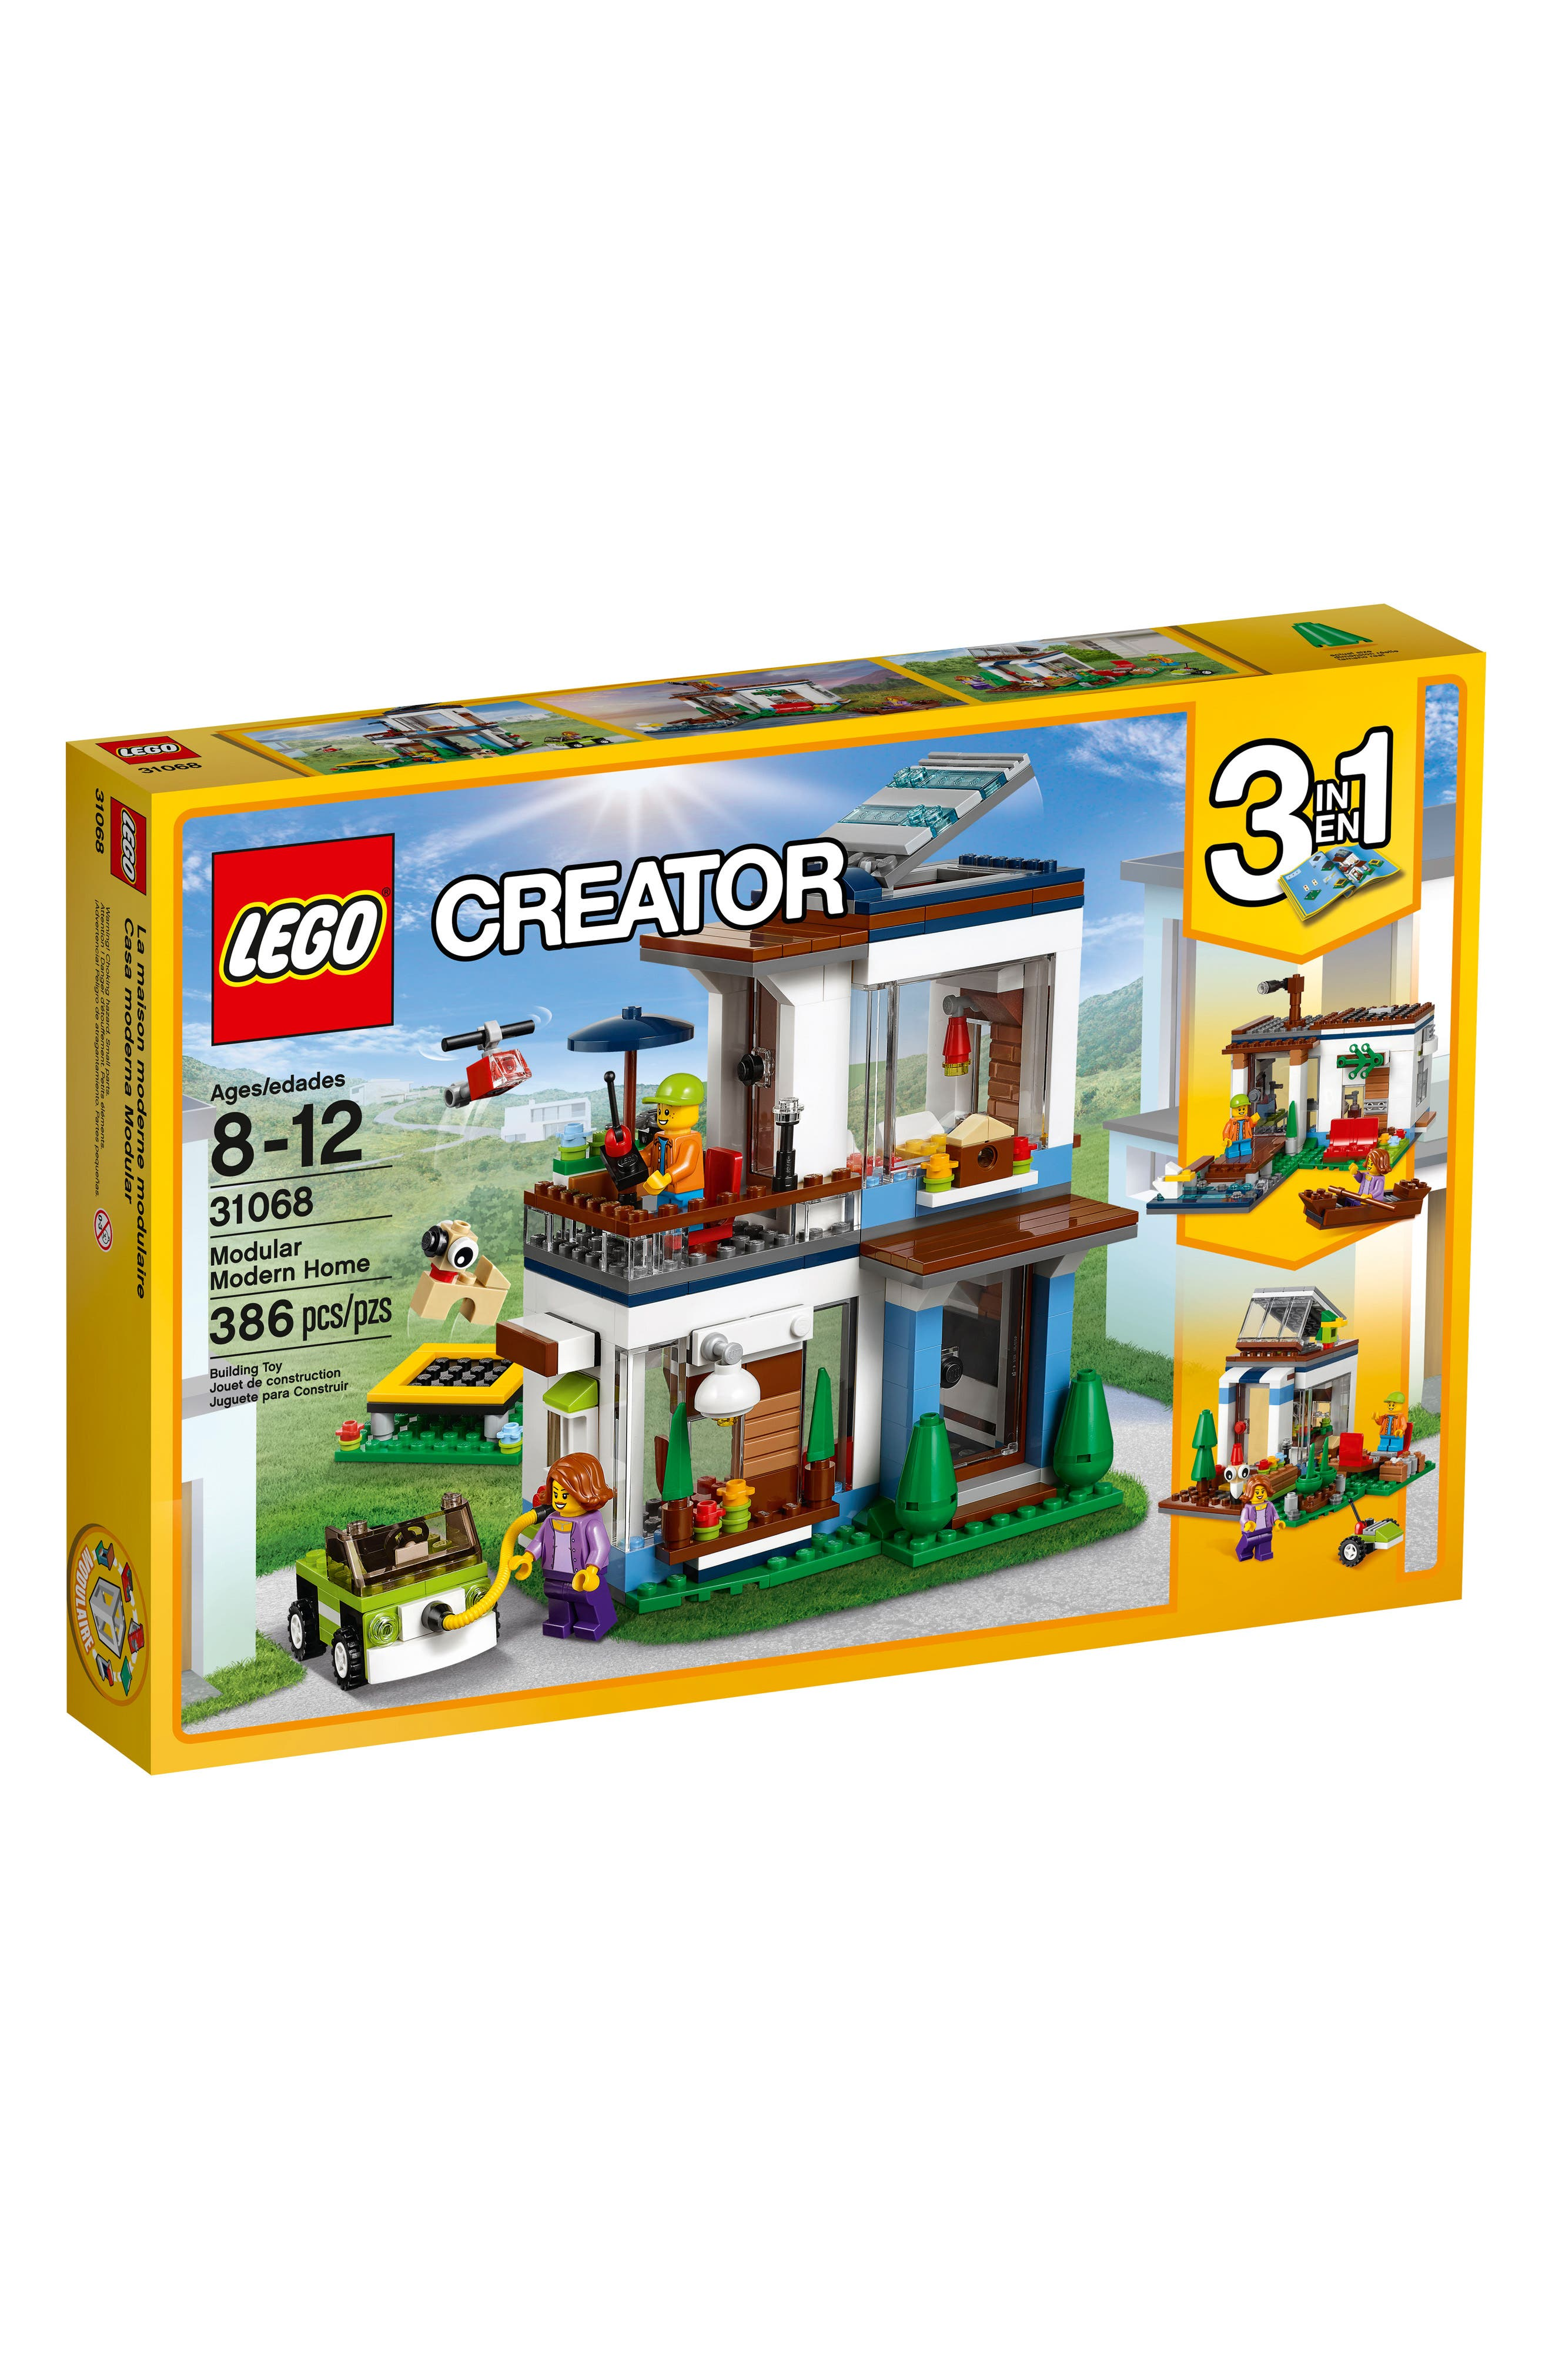 Alternate Image 1 Selected - LEGO® Creator 3-in-1 Modular Modern Home Play Set - 31068